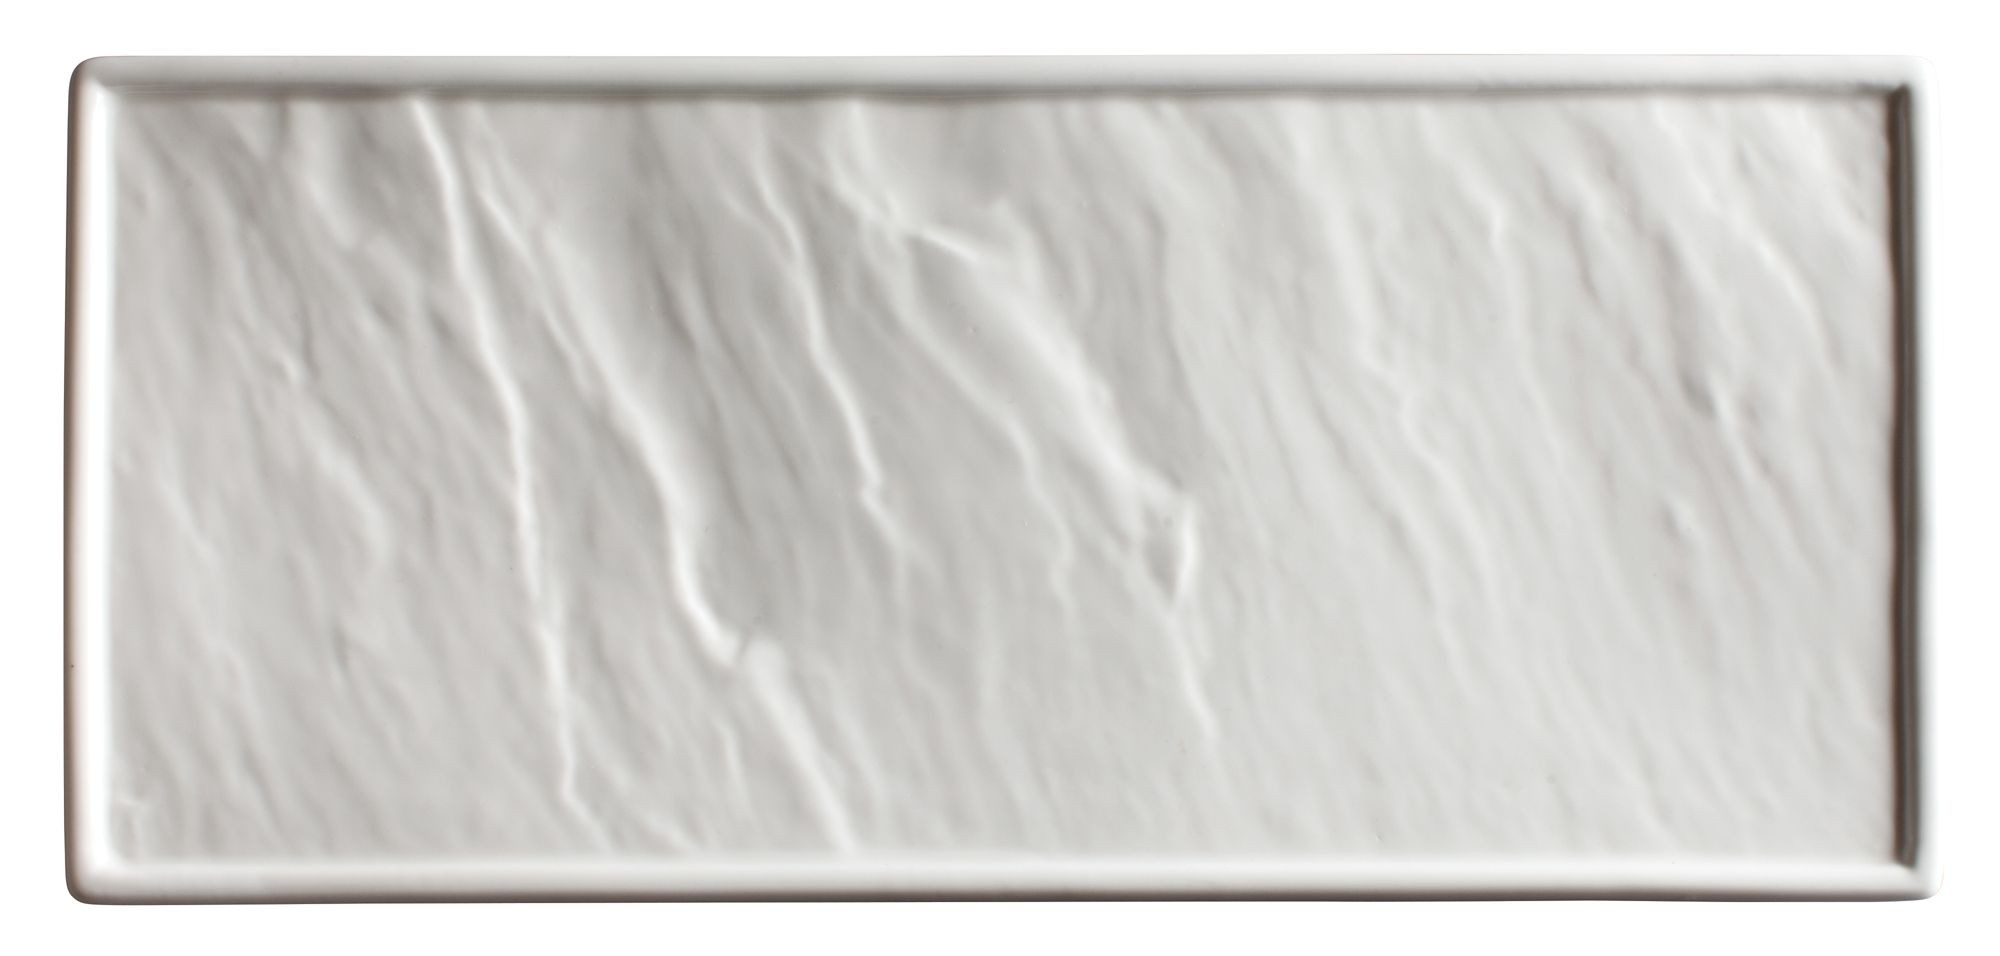 "Winco WDP001-201 Calacatta Creamy White Porcelain Rectangular Platter 10"" x 4-3/4"""